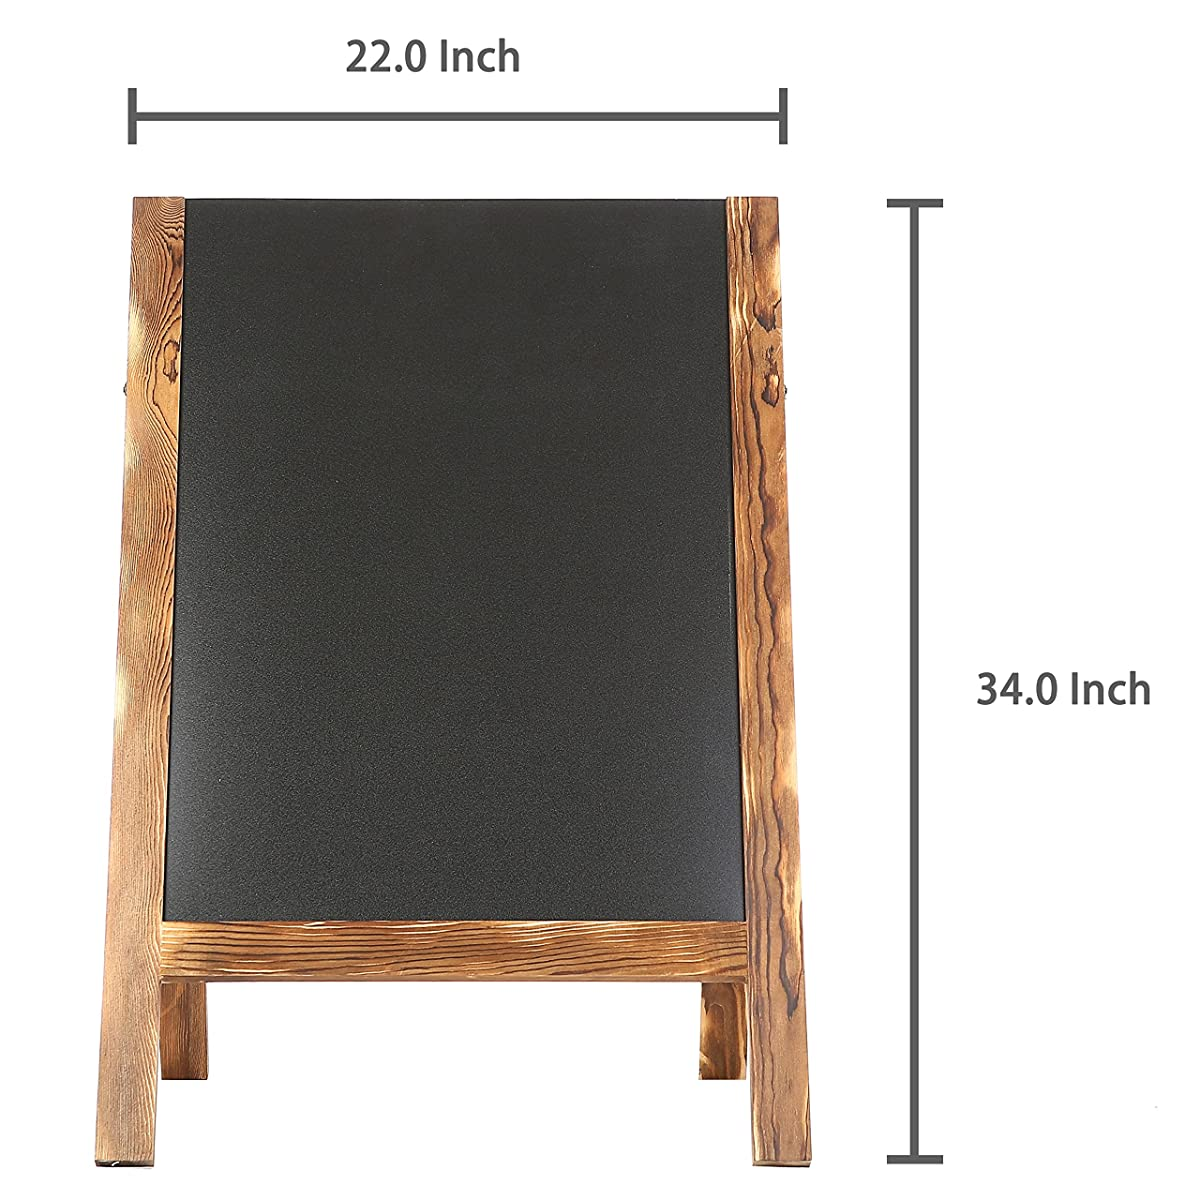 1 8 2 X 11 Hinged Frame